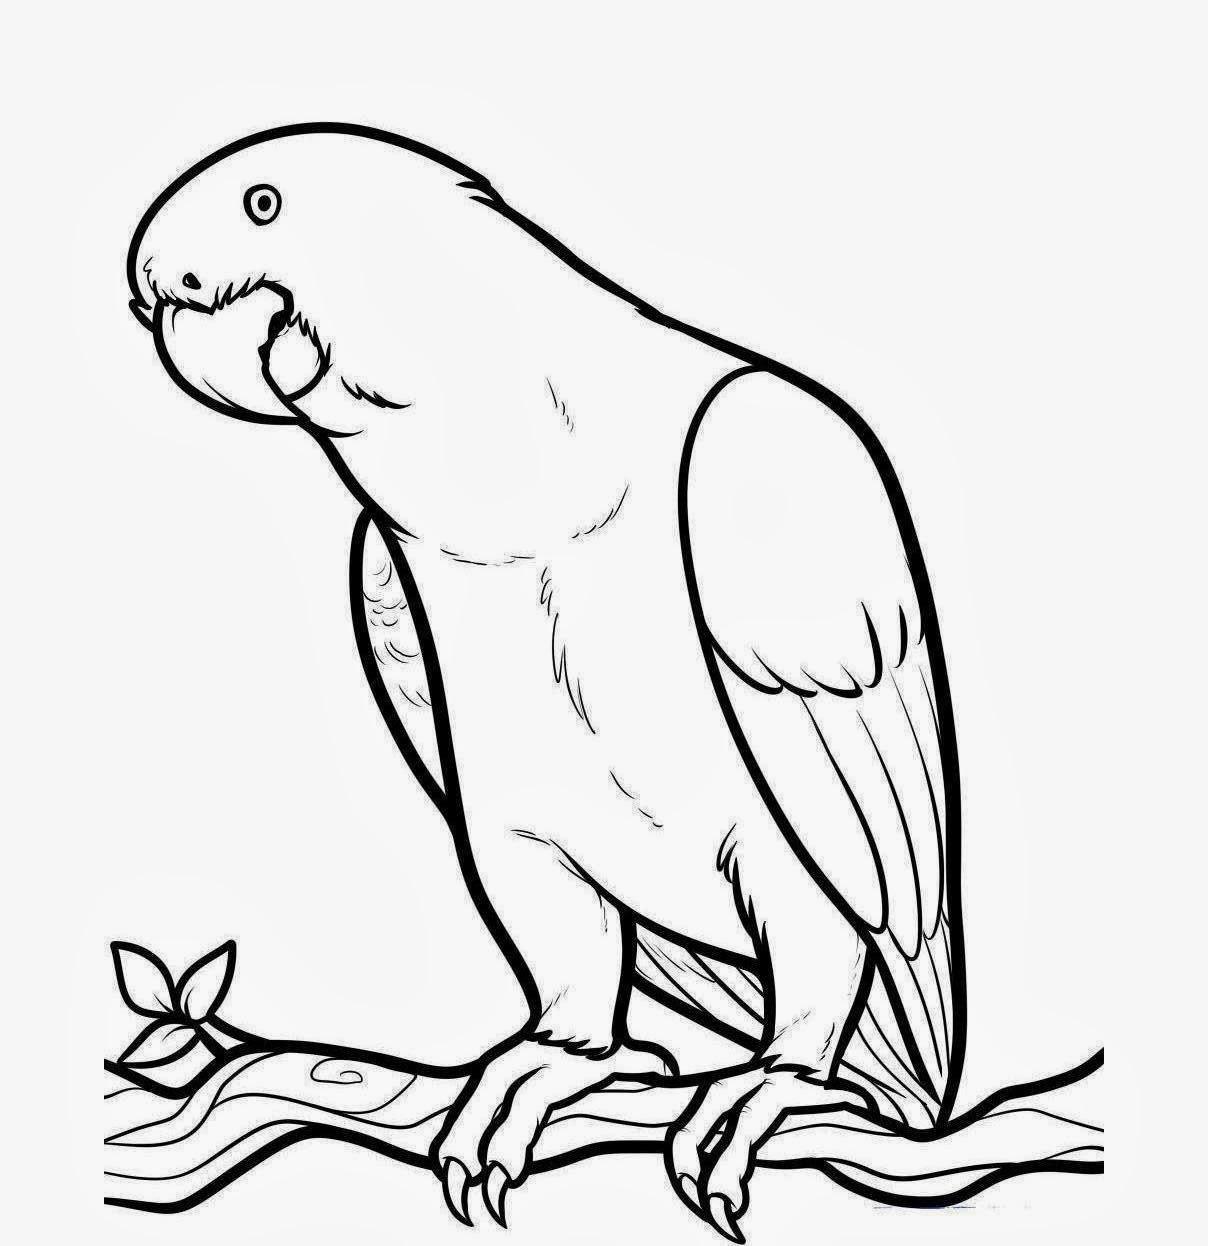 Coloring pages quail - Quail Coloring Pages